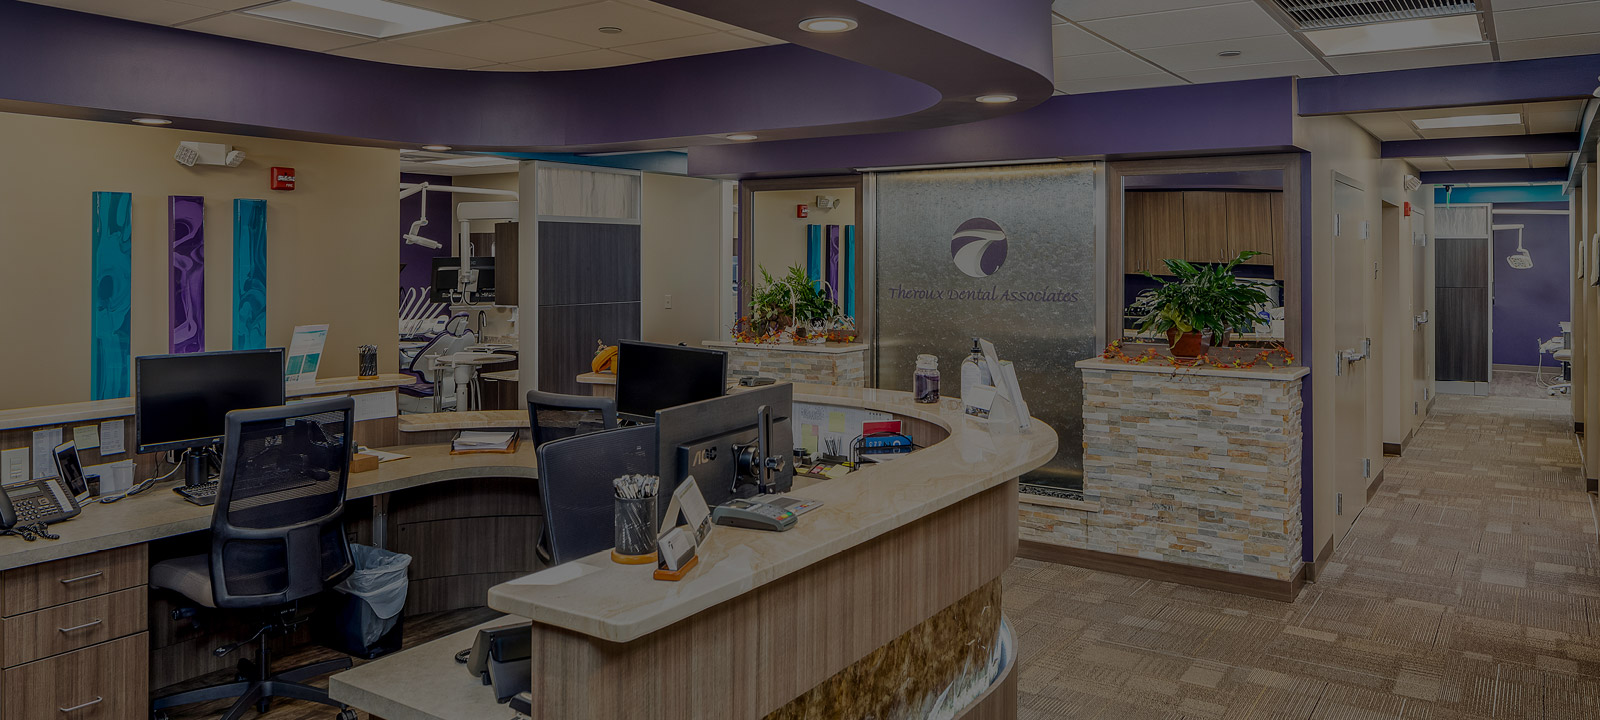 Theroux Dental clinician desk